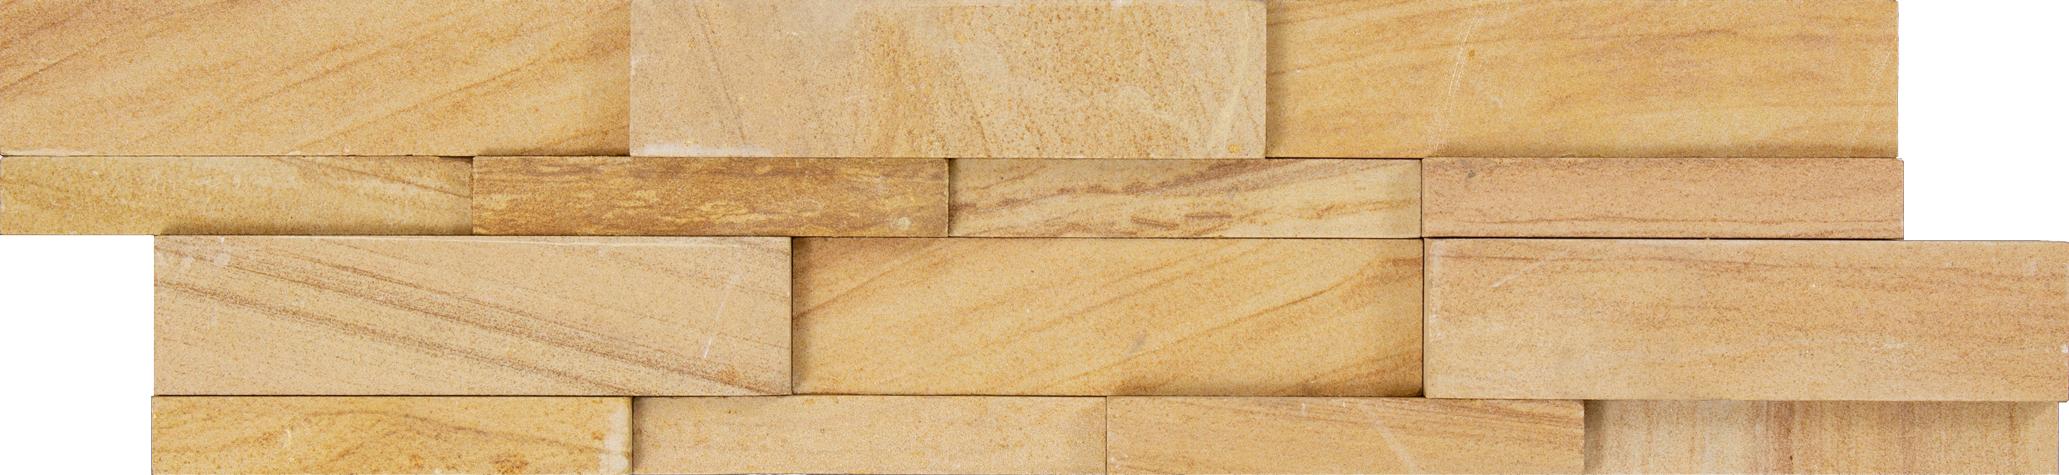 Teakwood Ledger Panel Closeup Piece